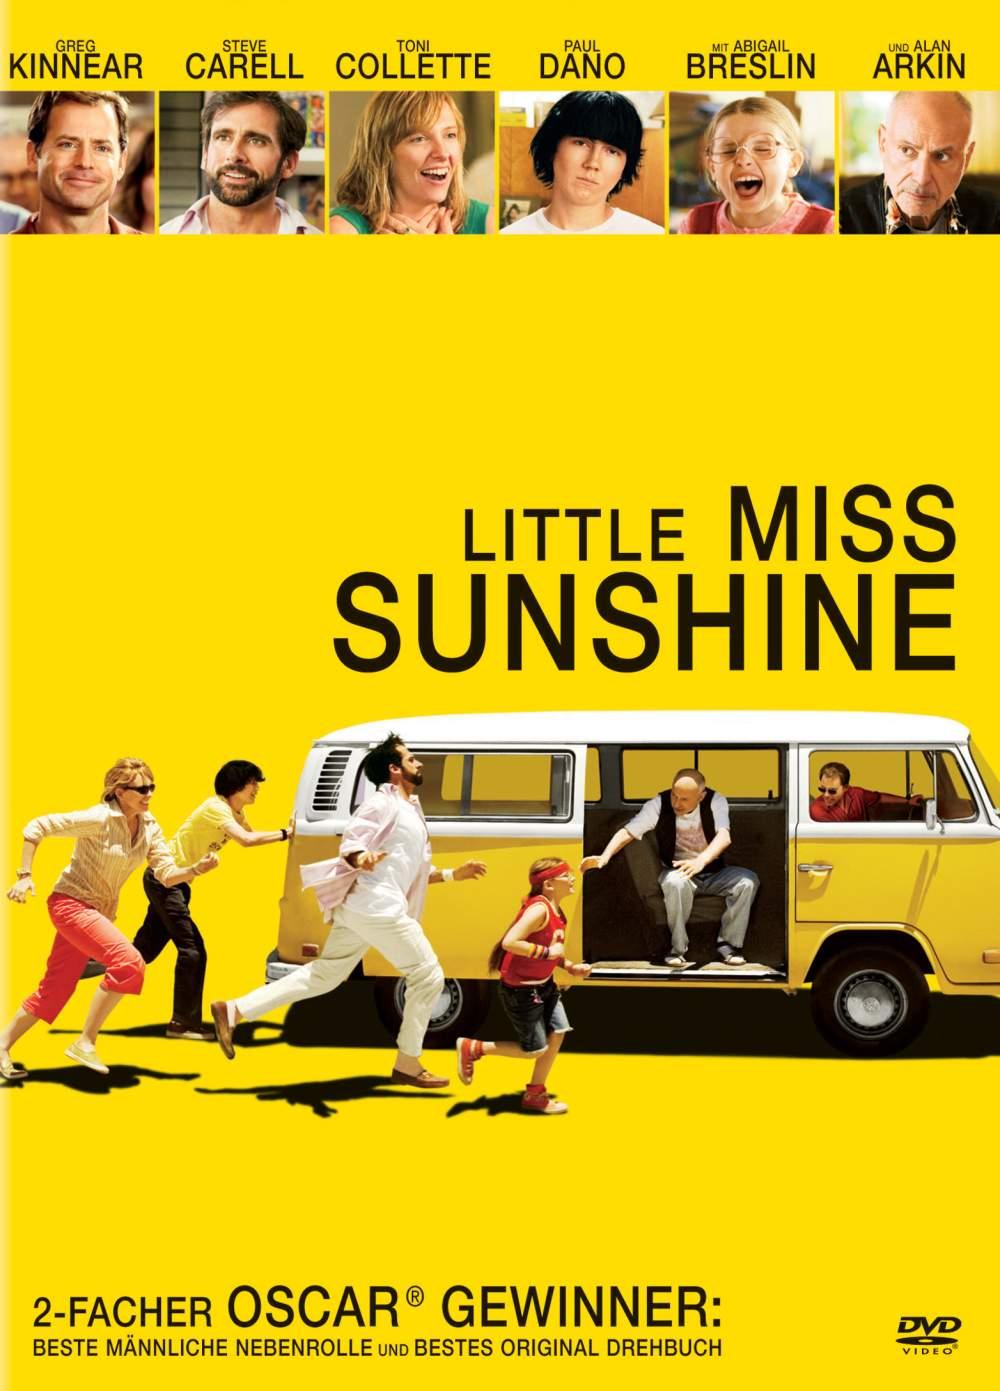 lil miss sunshine Little miss sunshine 818k likes now available on digital:.